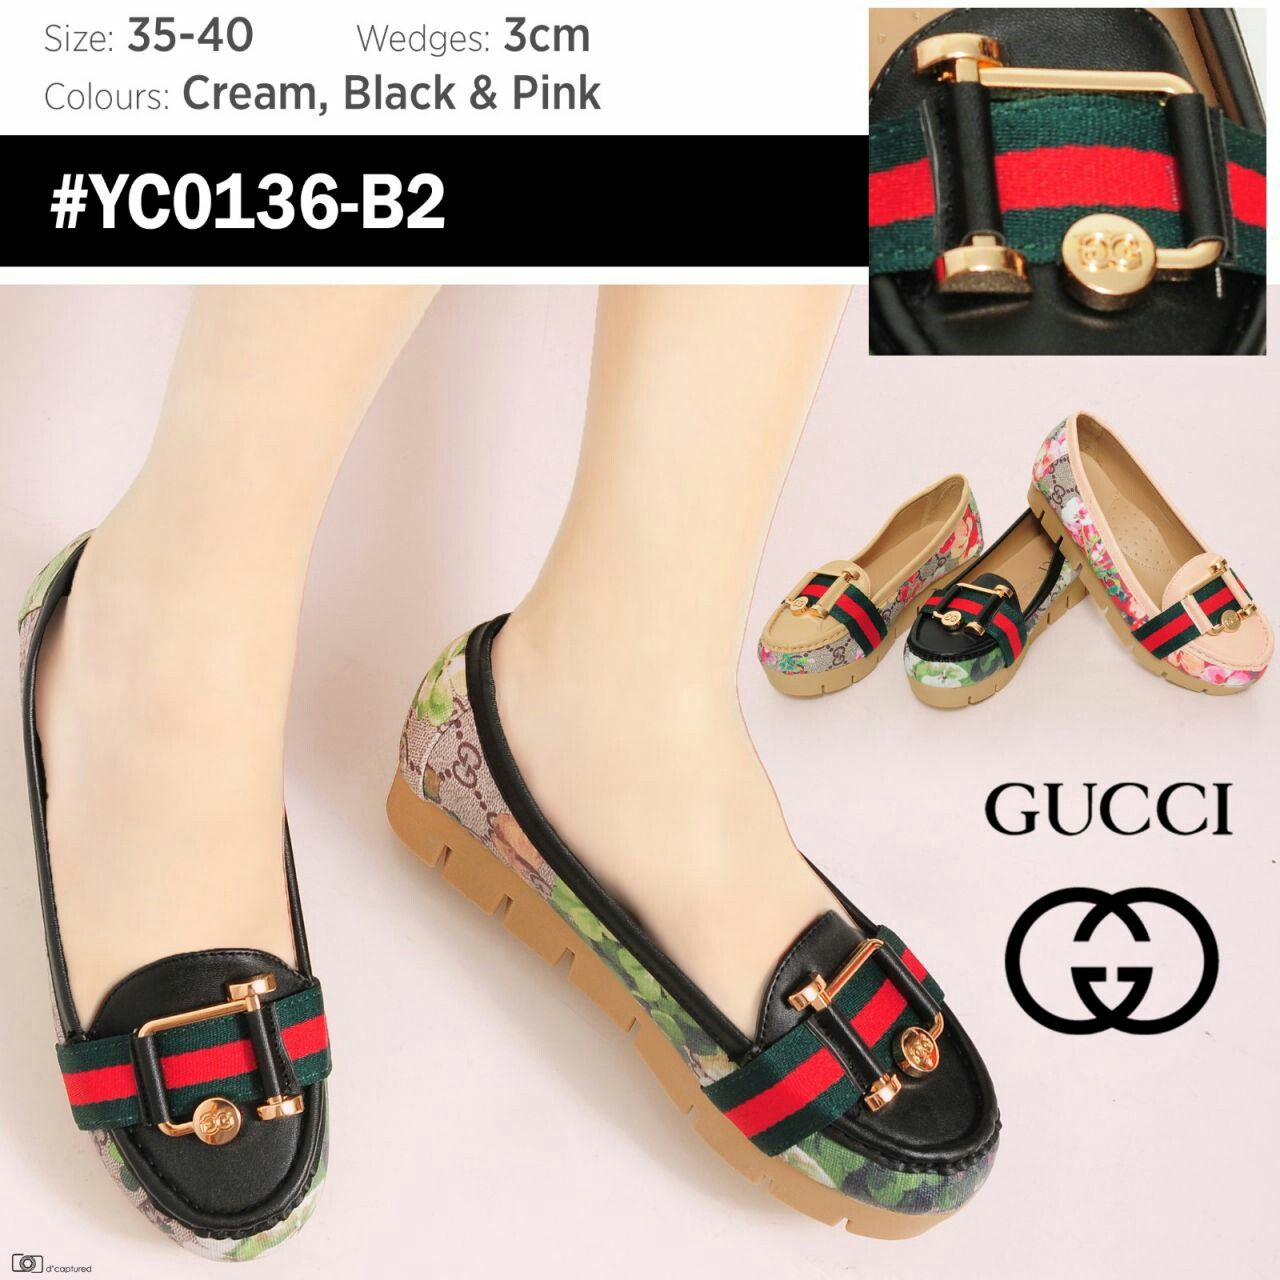 Gucci Flower YC0136-B2 Sol 3cm 35 - 40 (ukuran besar 1 nomor) 275rb